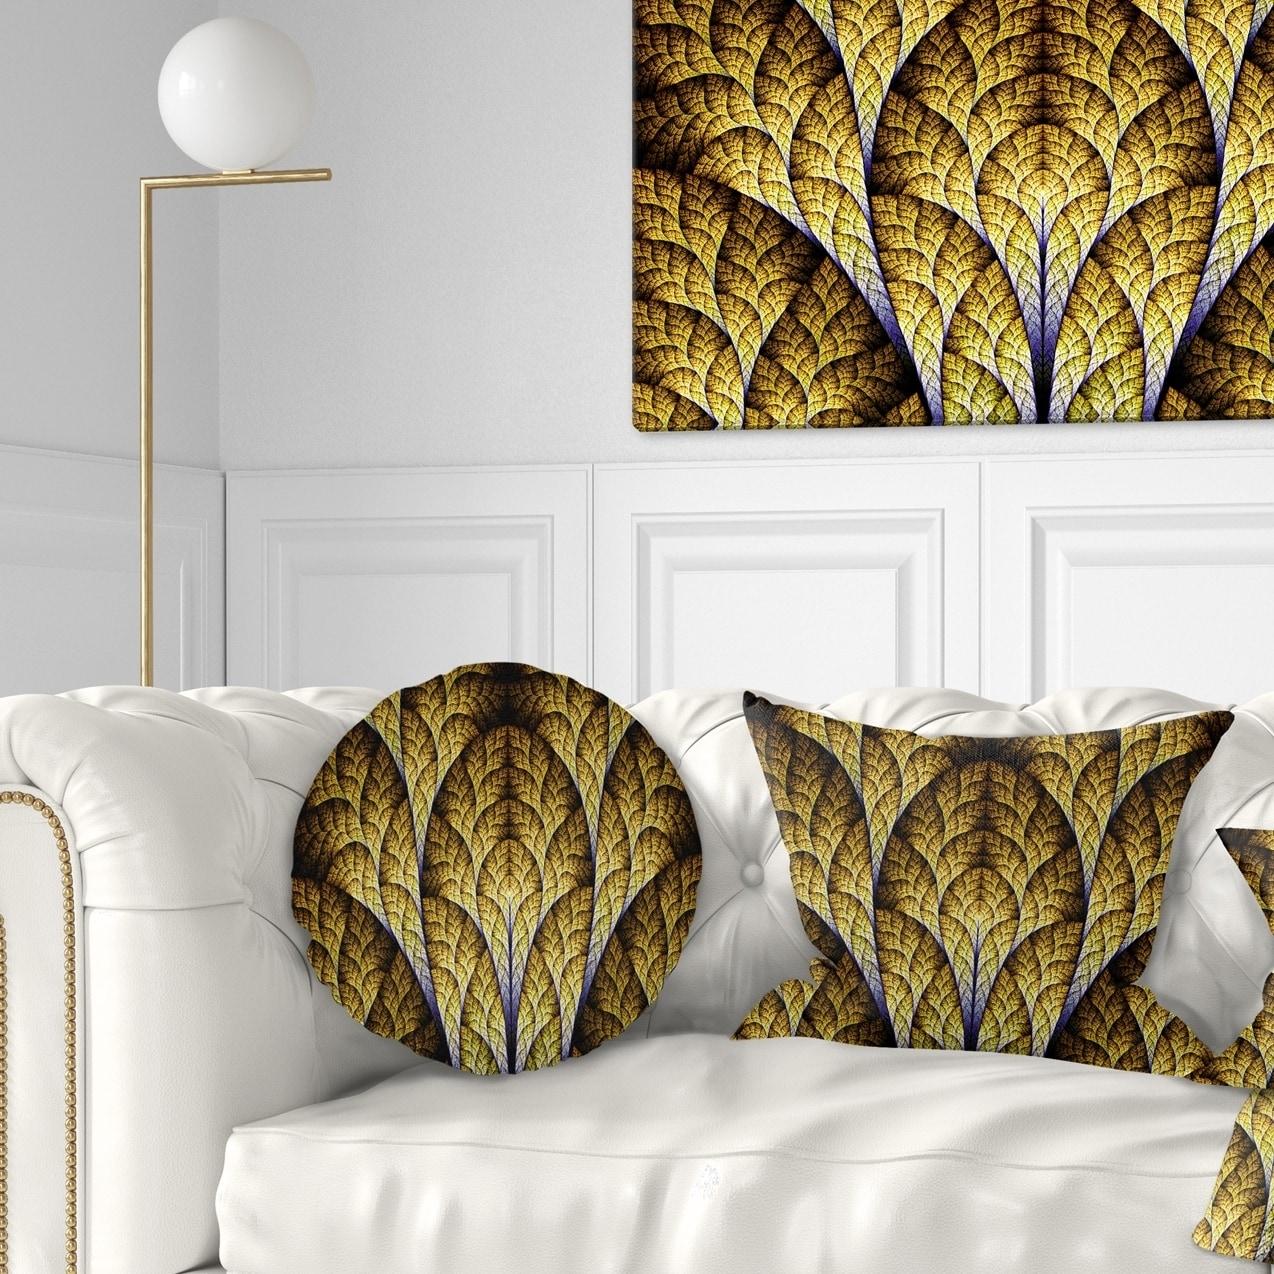 X 26 In Designart Cu12112 26 26 Unique Orange Fractal Design Pattern Abstract Cushion Cover For